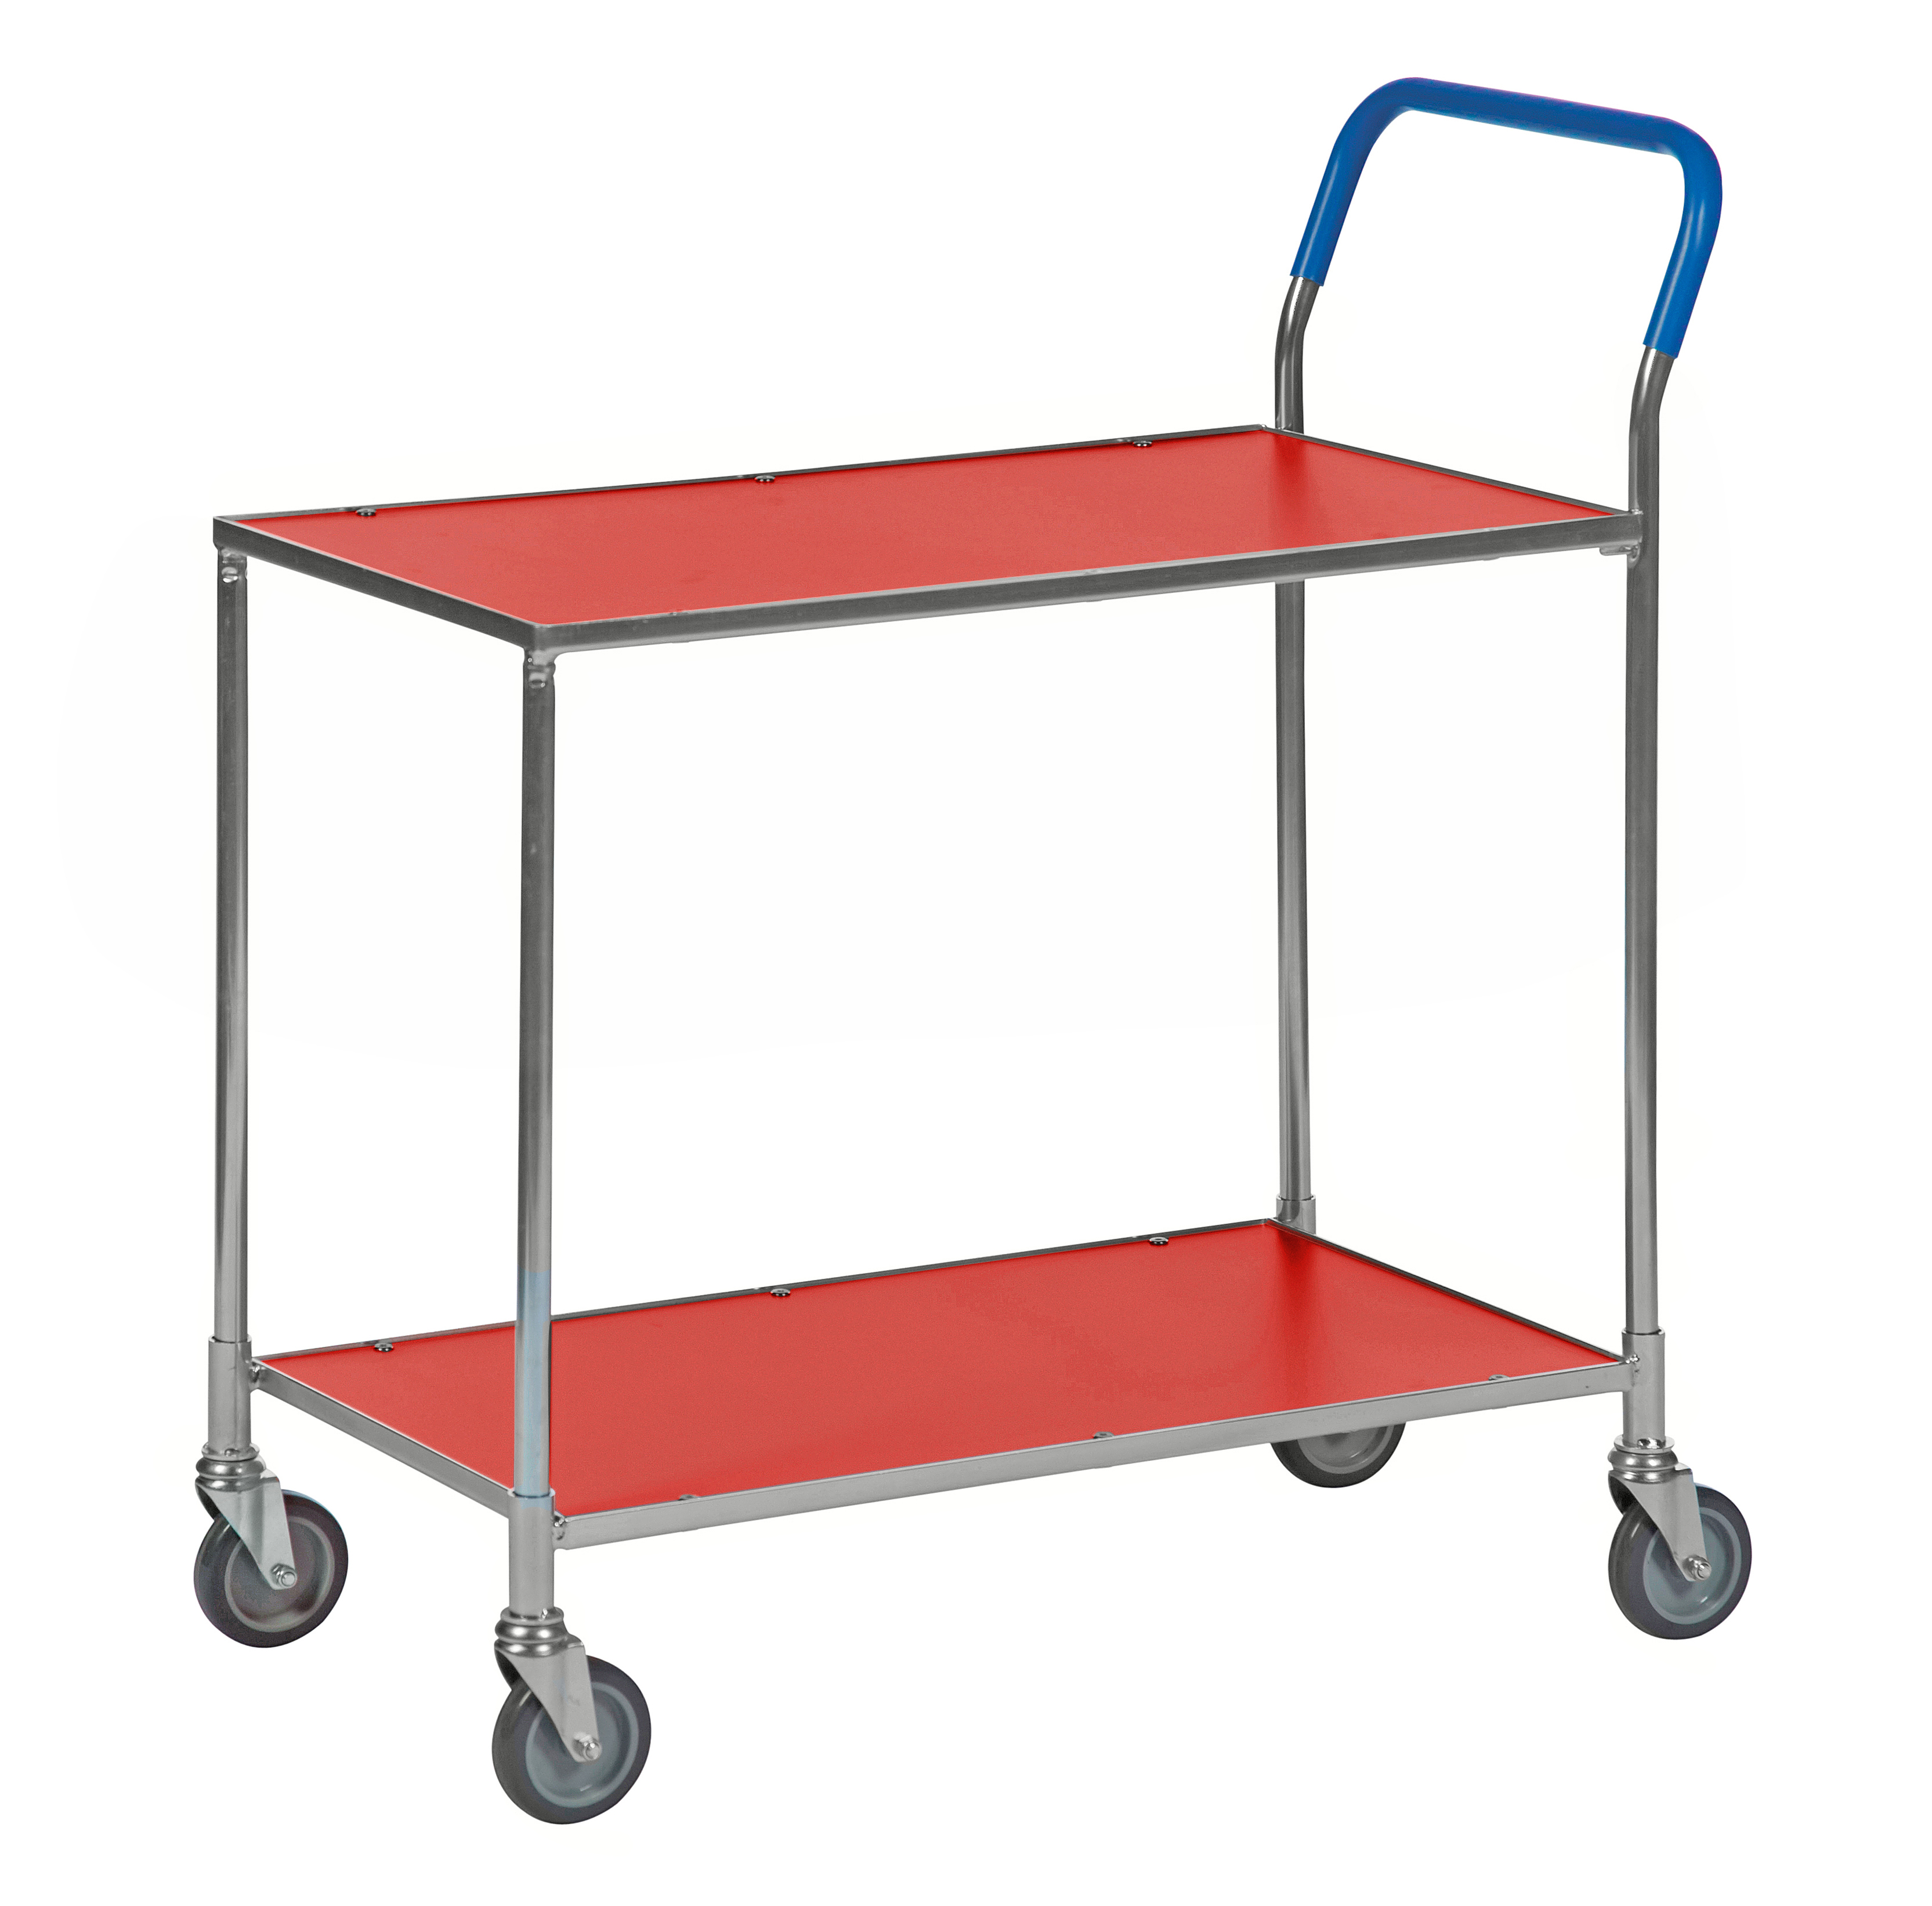 KM1720-1 | Table trolley